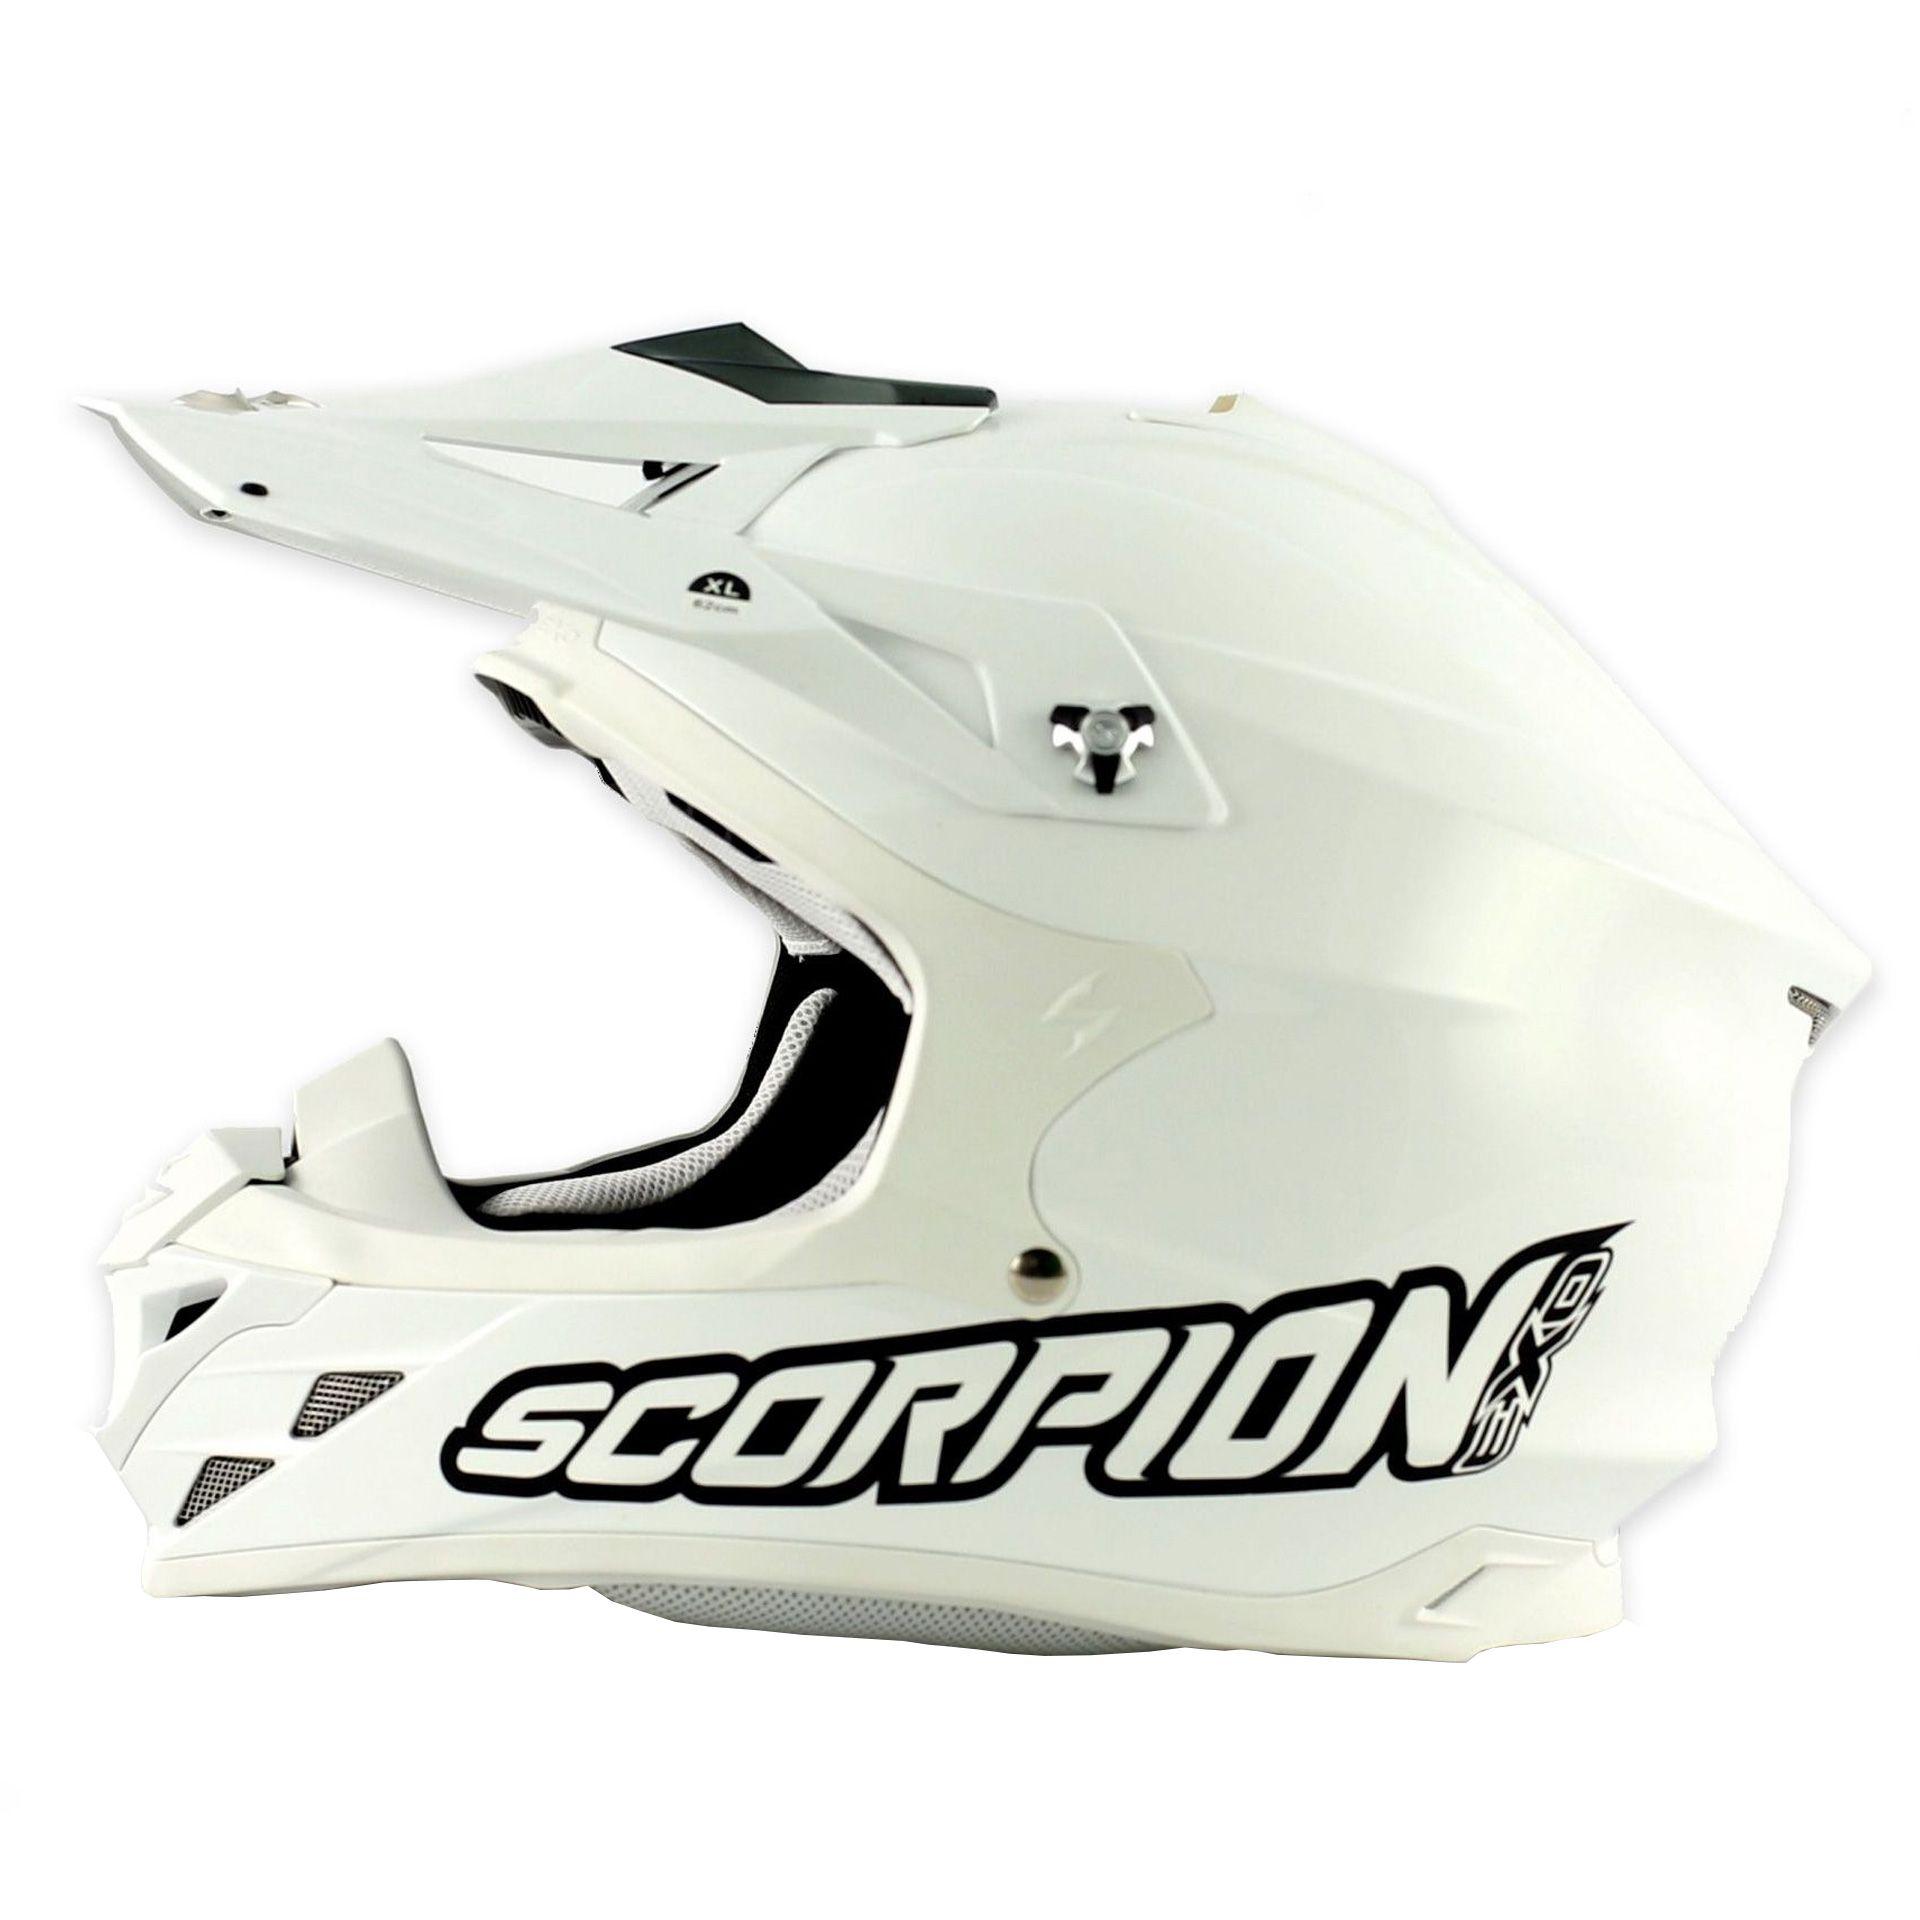 Casque cross Scorpion VX-15 EVO AIR Blanc - L